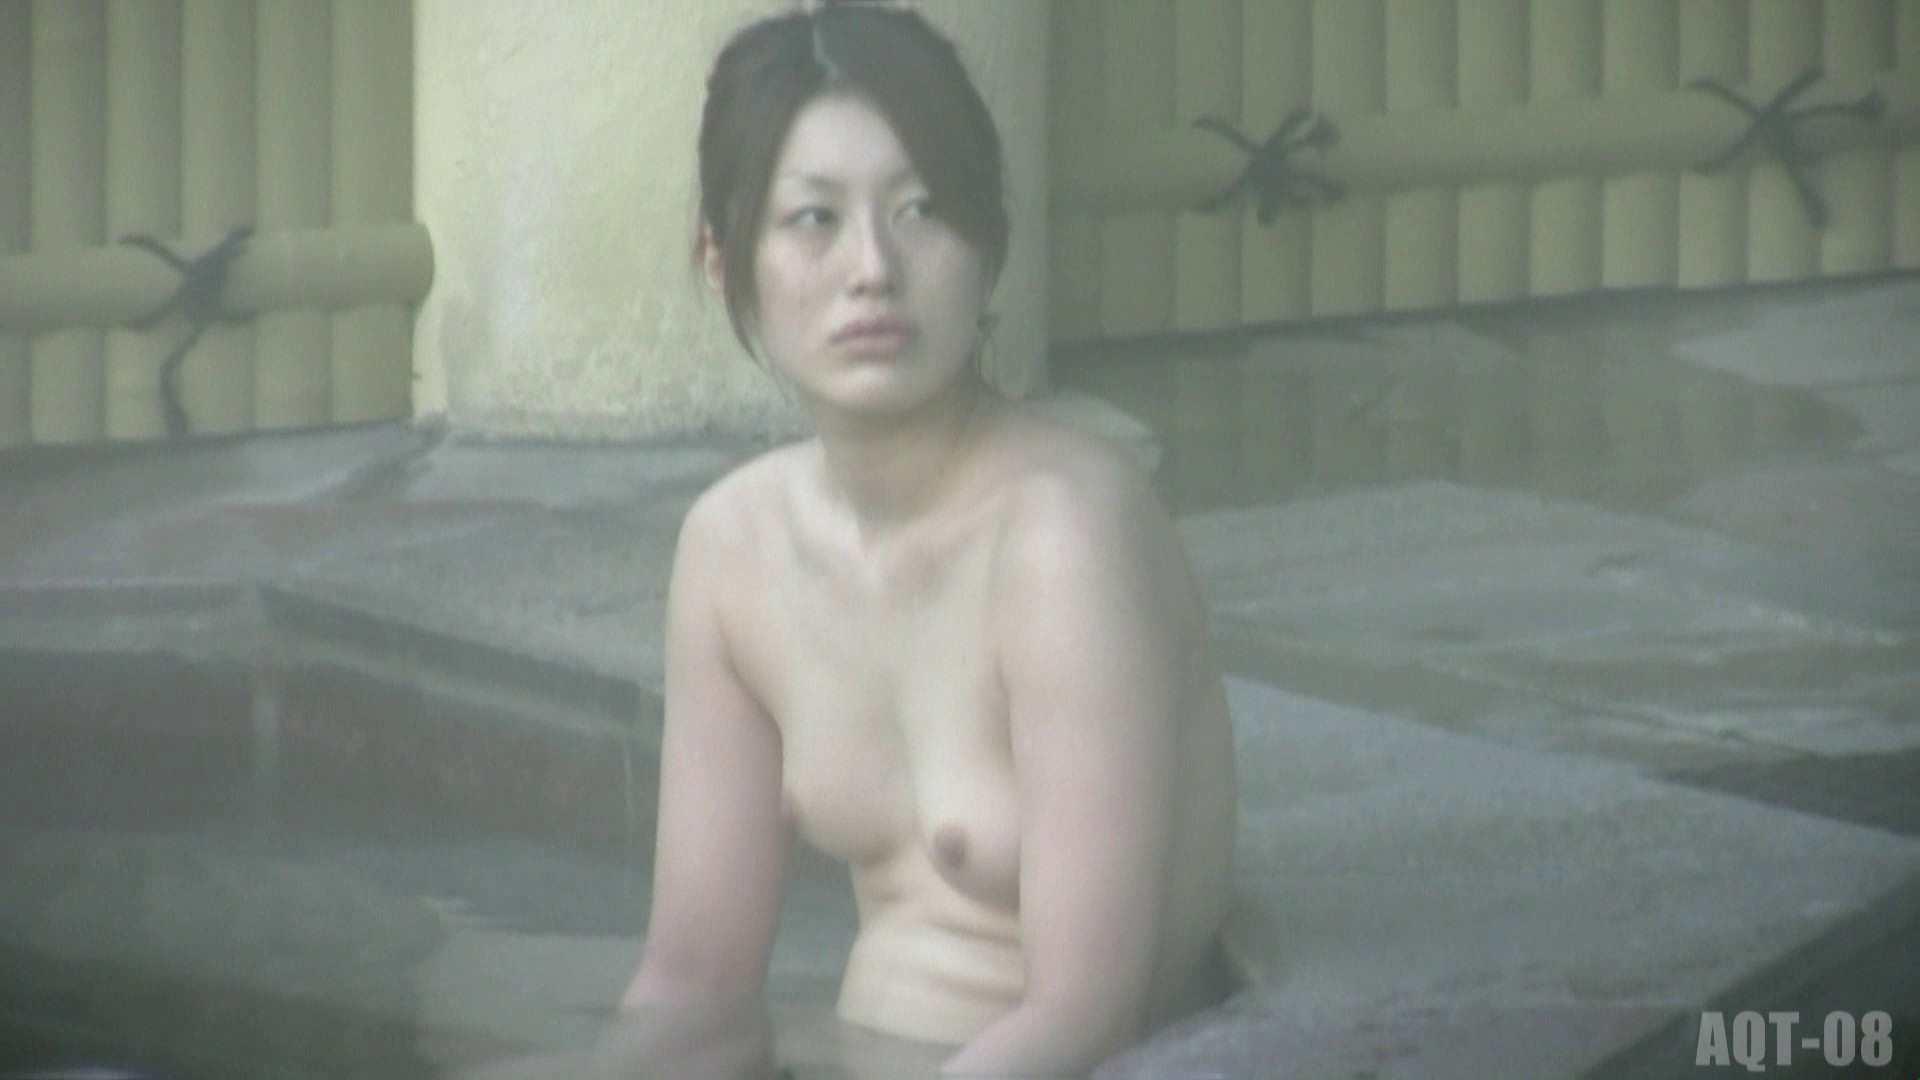 Aquaな露天風呂Vol.775 盗撮師作品 AV無料動画キャプチャ 98pic 26